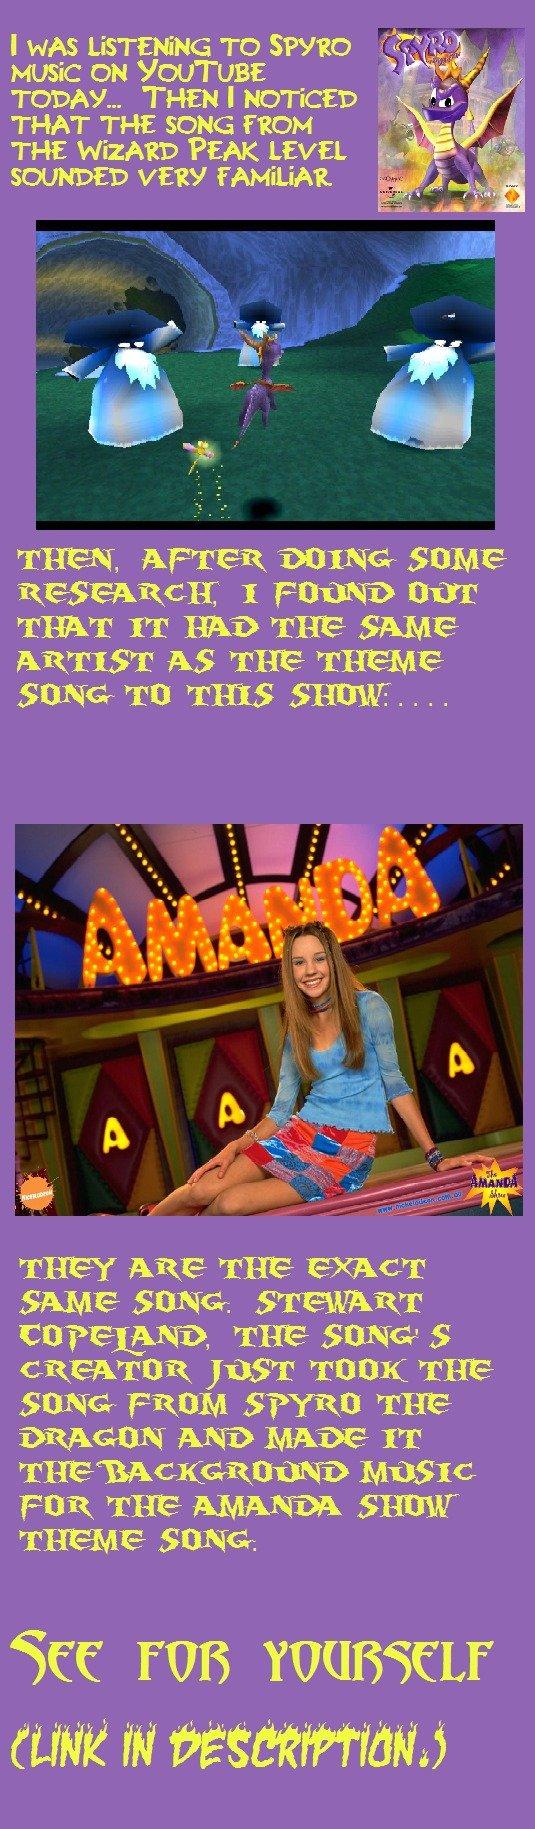 "My Mind Was Blown. Amanda Theme: www.youtube.com/watch?v=K-sc1hlHR-A&f... Spyro: www.youtube.com/watch?v=-yQNs6SAXEE&f.... THAT THE SONG mom ""E iie '. . THE ' D spyro amanda show"